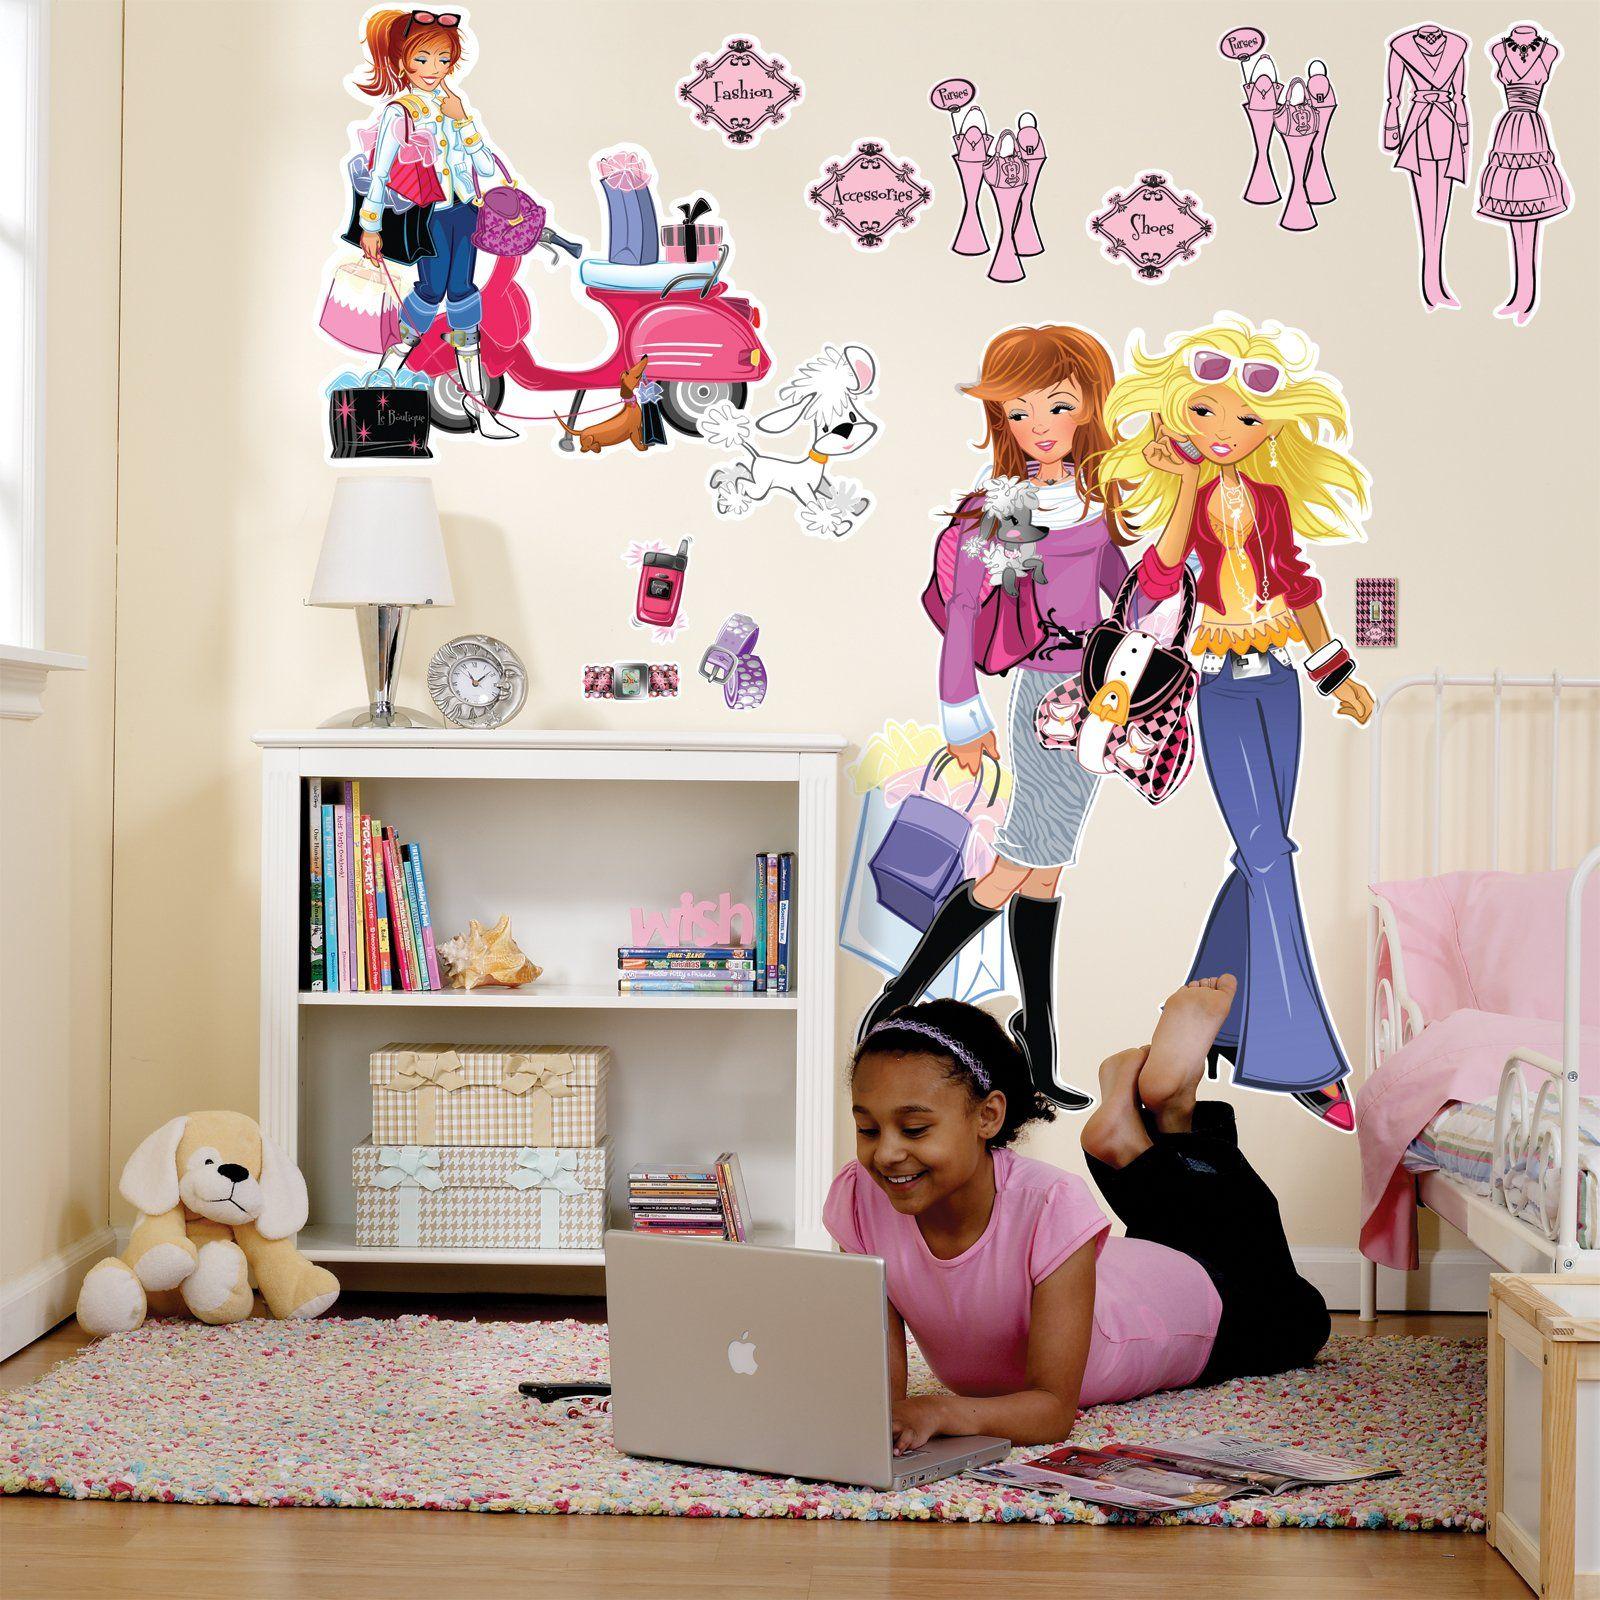 Fashionista Bedroom Ideas: Kids Fashionista Bedrooms - Google Search